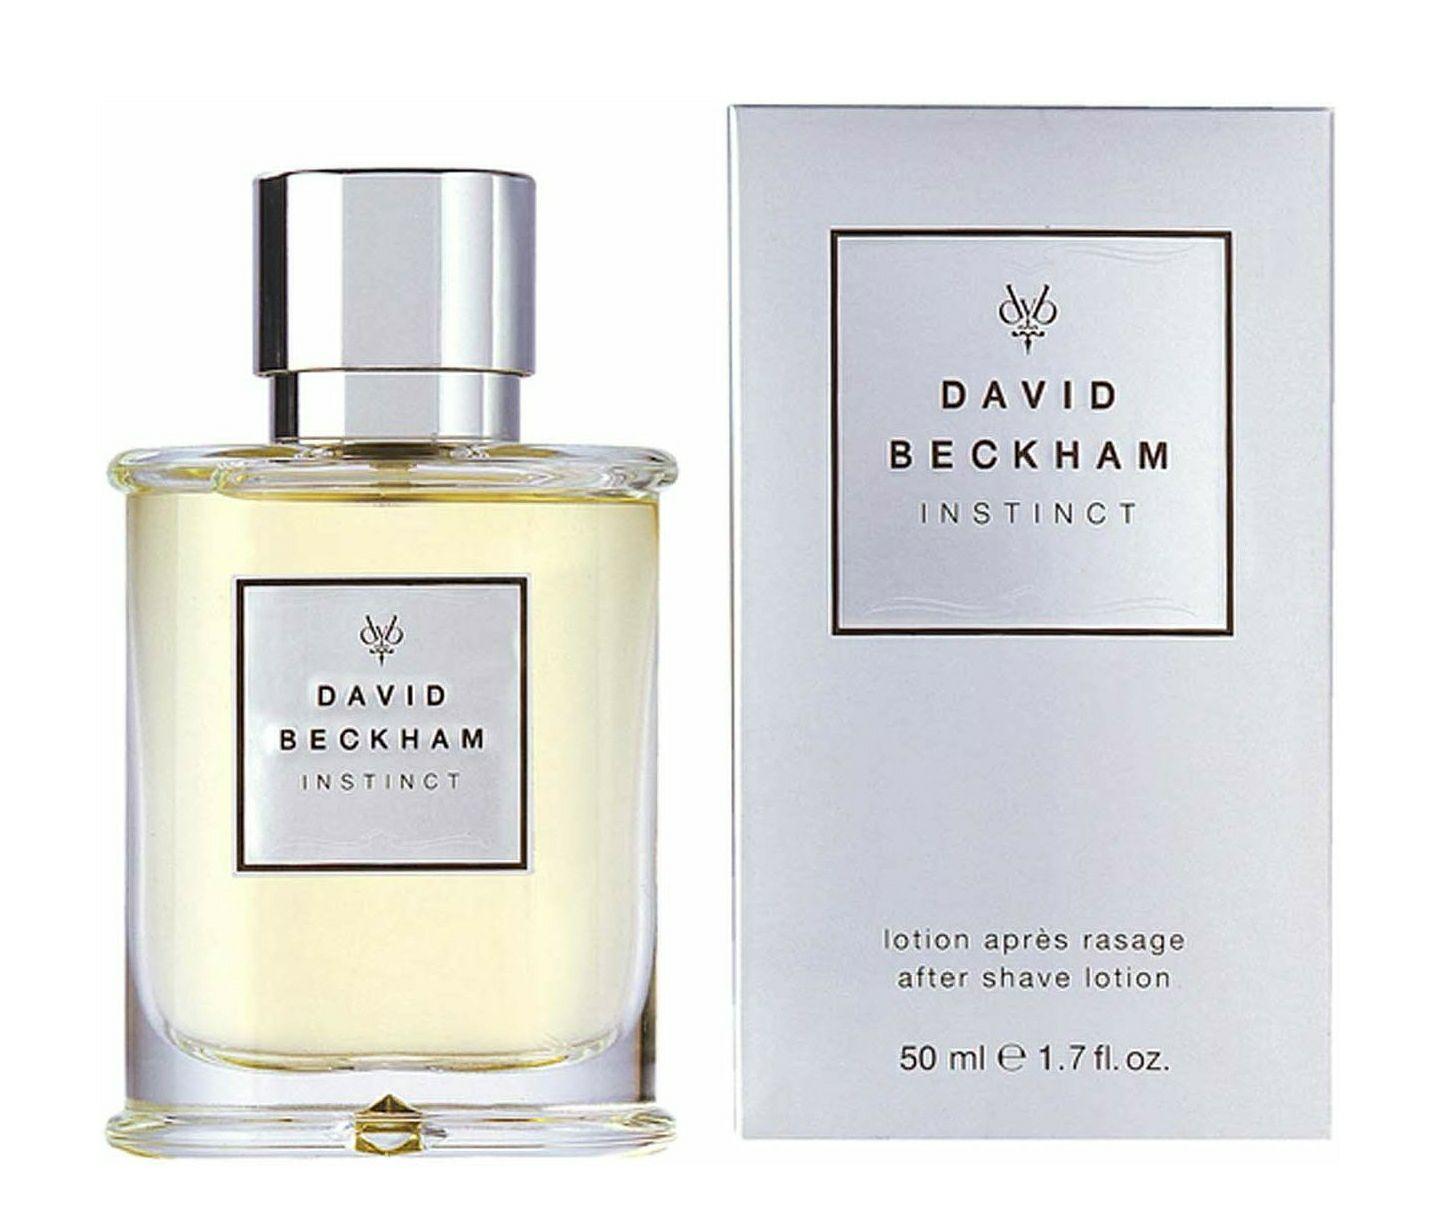 David Beckham Instinct Fragrance Aftershave Lotion for Men, 50 ml - £5.33 @ Amazon (+£4.49 non-Prime)